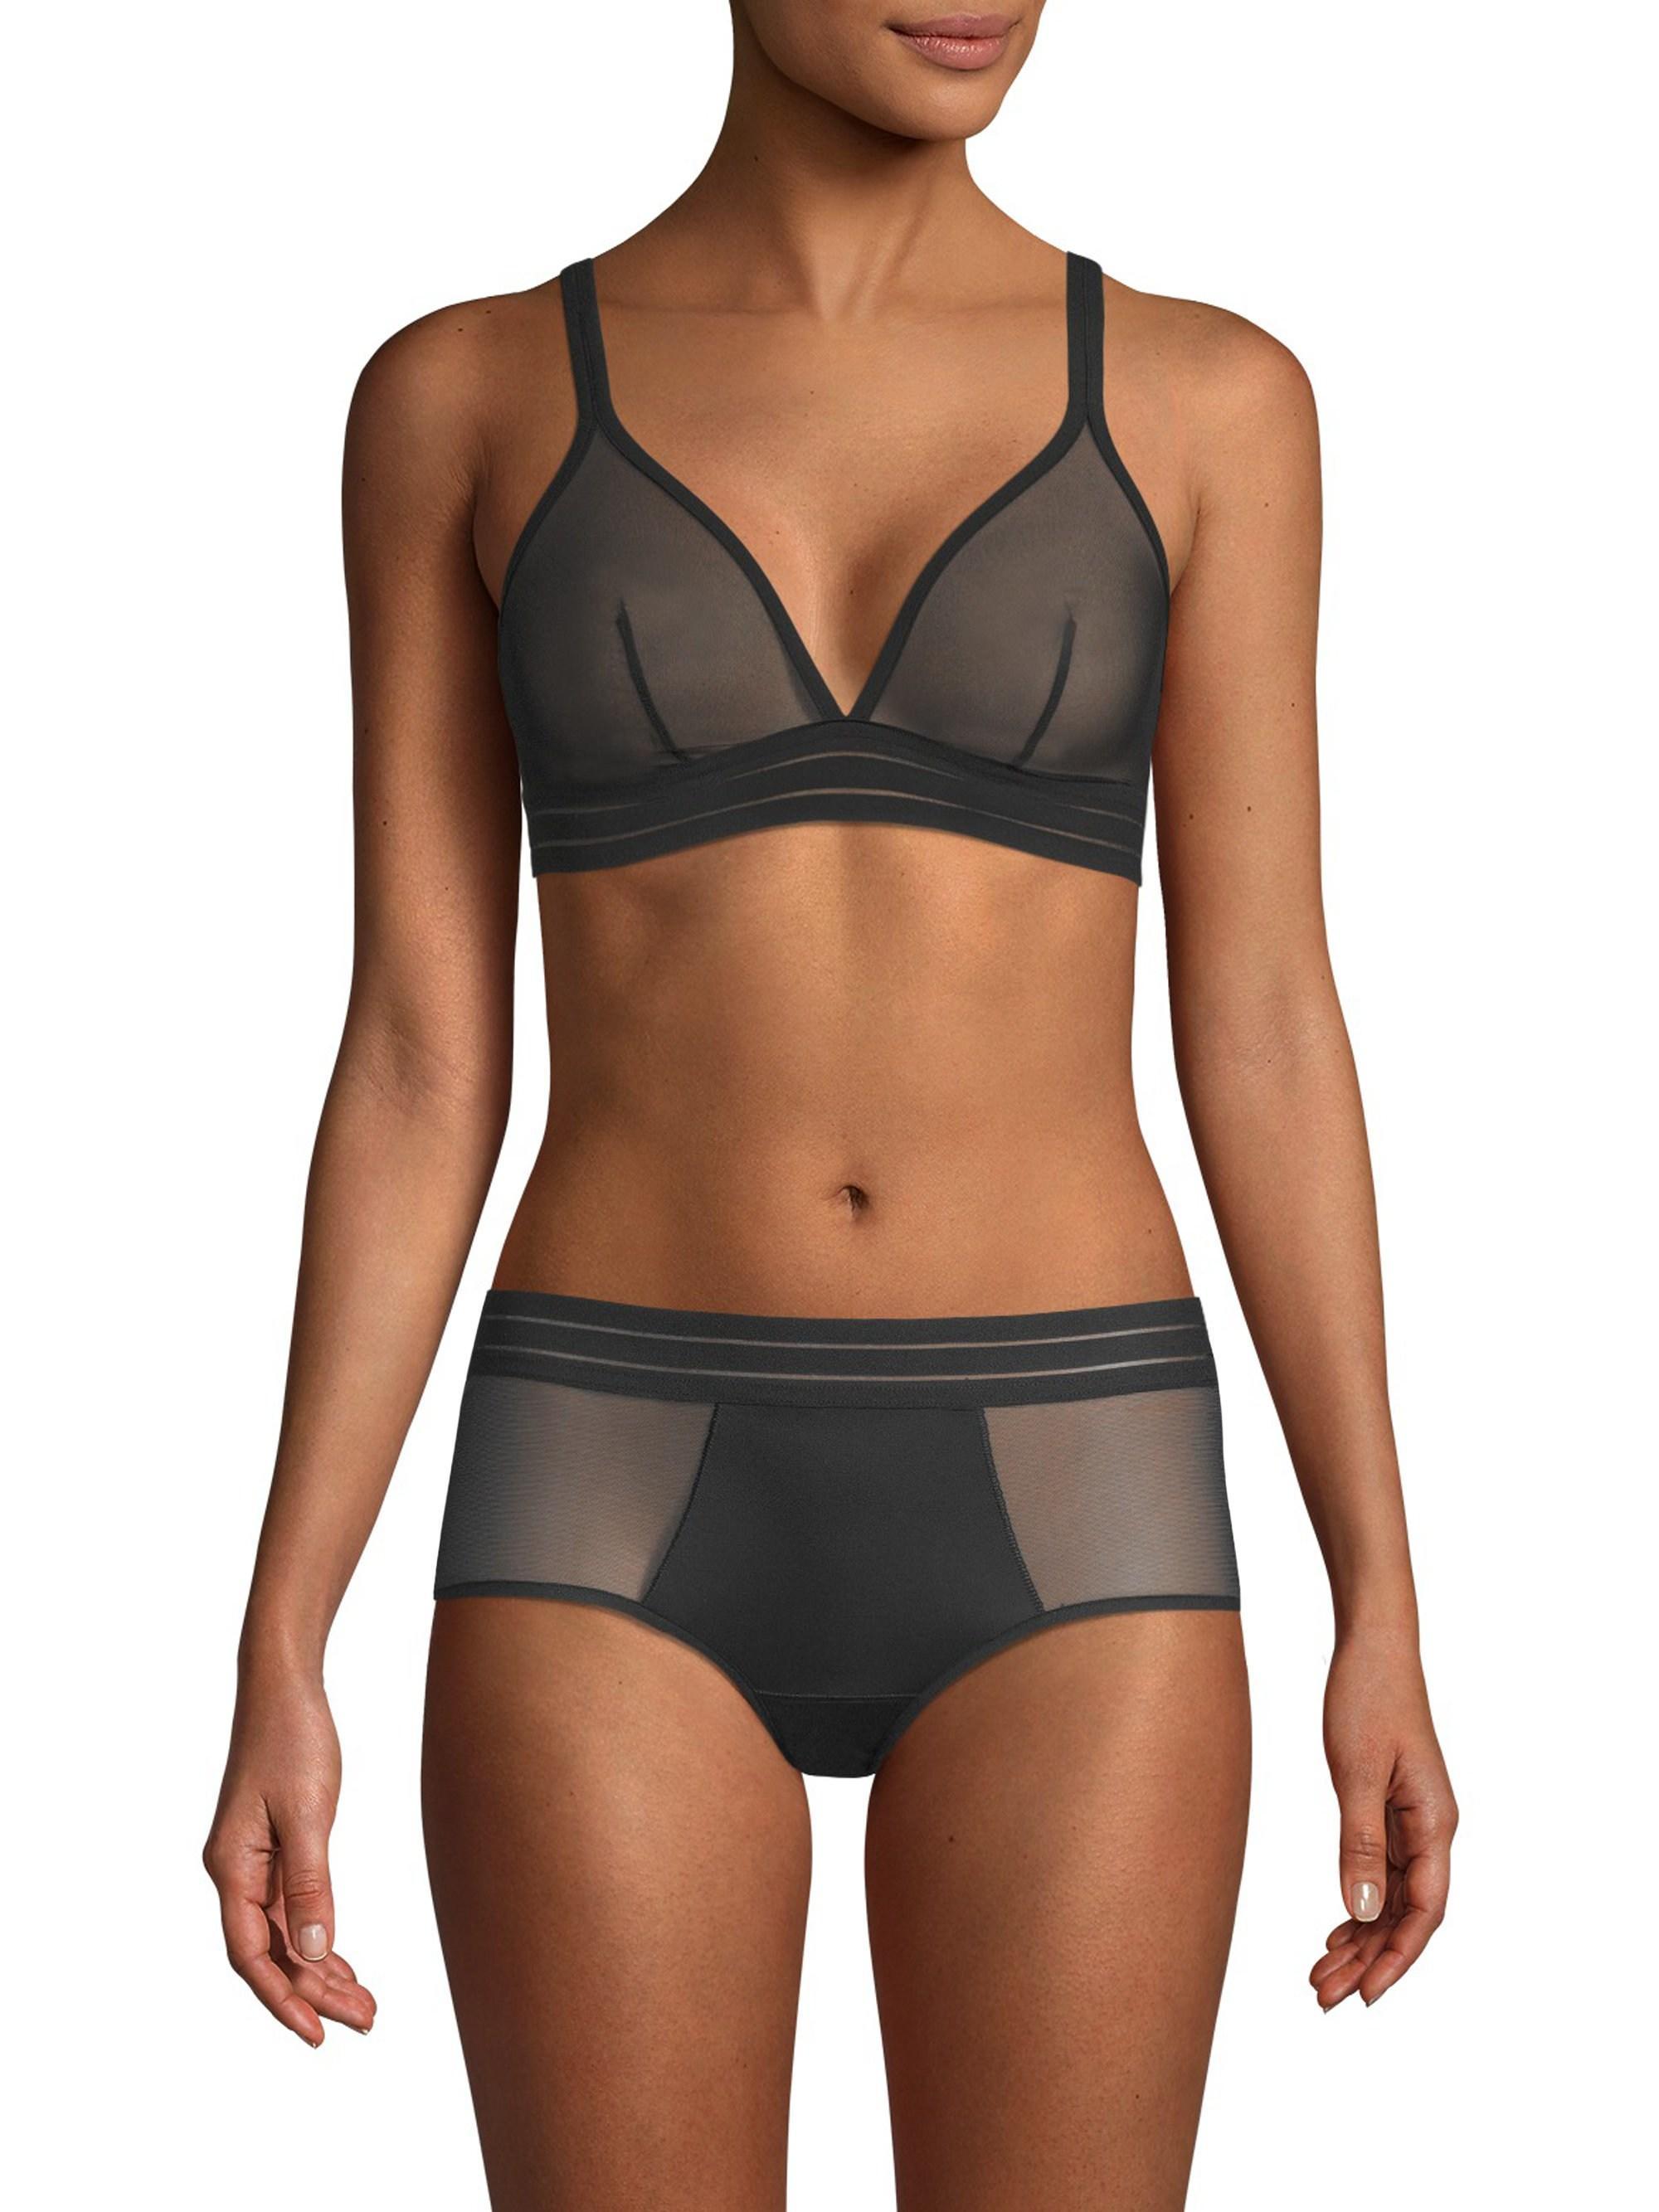 5603355242412a Maison Lejaby Women s Nufit Triangle Bra - Power Skin - Size Xs in ...